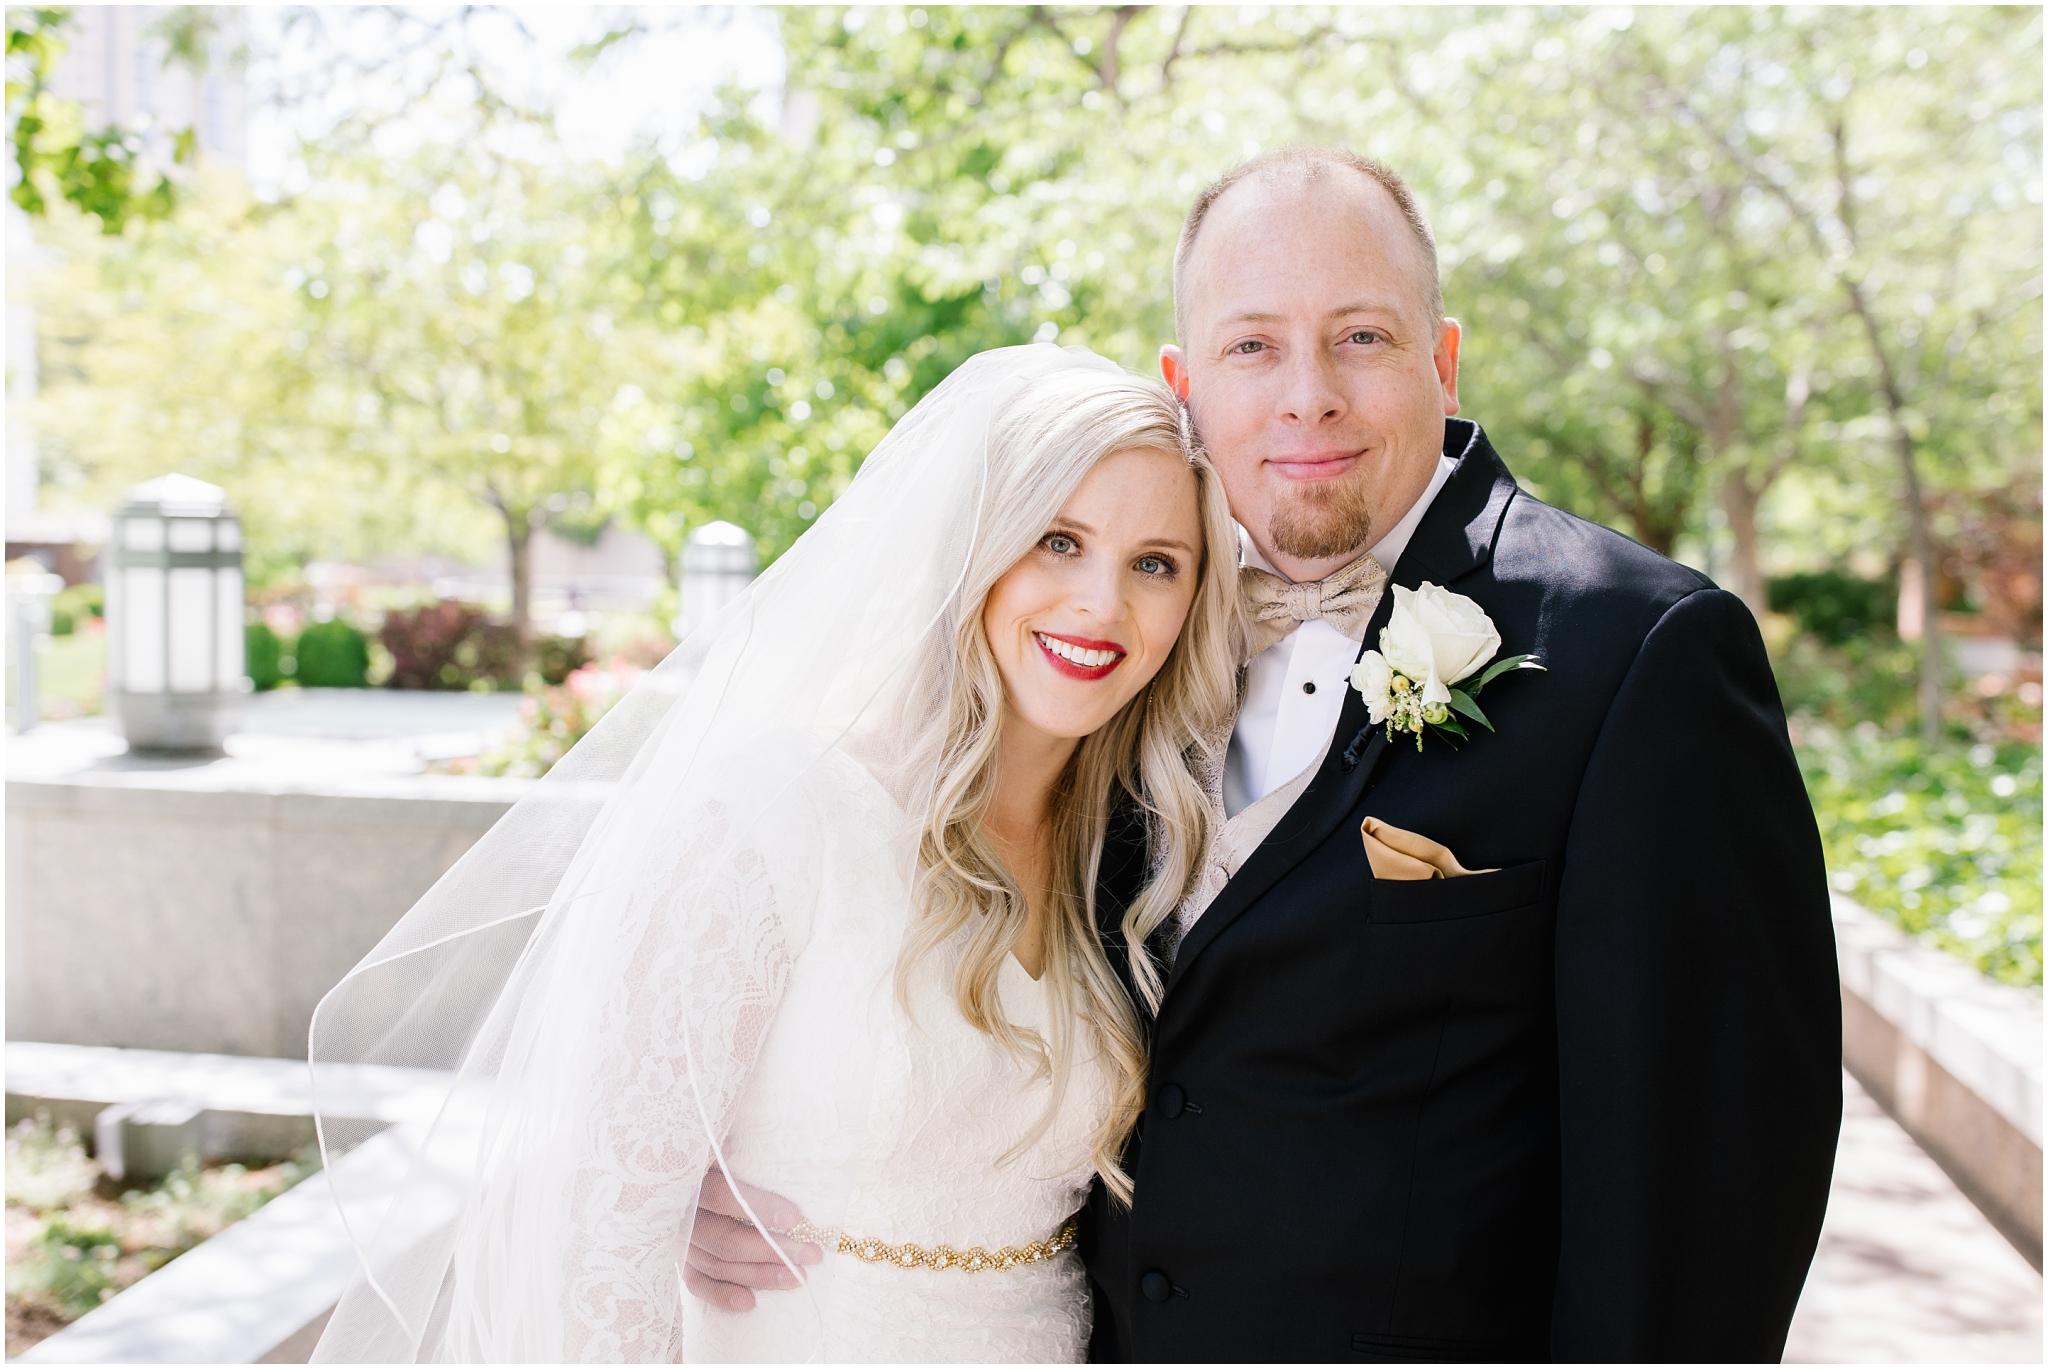 CherylandTyler-320_Lizzie-B-Imagery-Utah-Wedding-Photographer-Salt-Lake-City-Temple-Wells-Fargo-Building-Reception.jpg